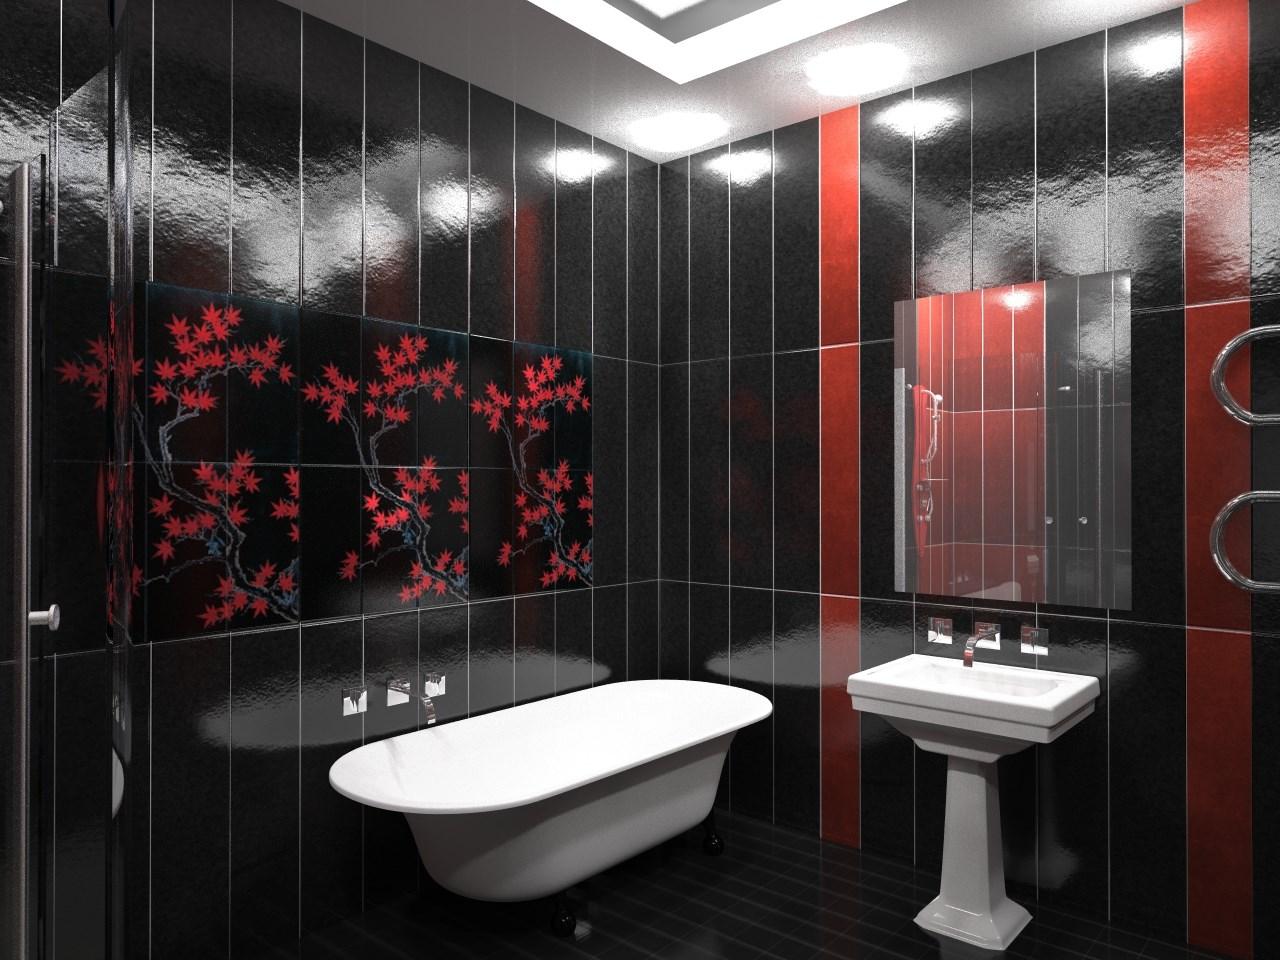 Ванны ремонт панелями дизайн